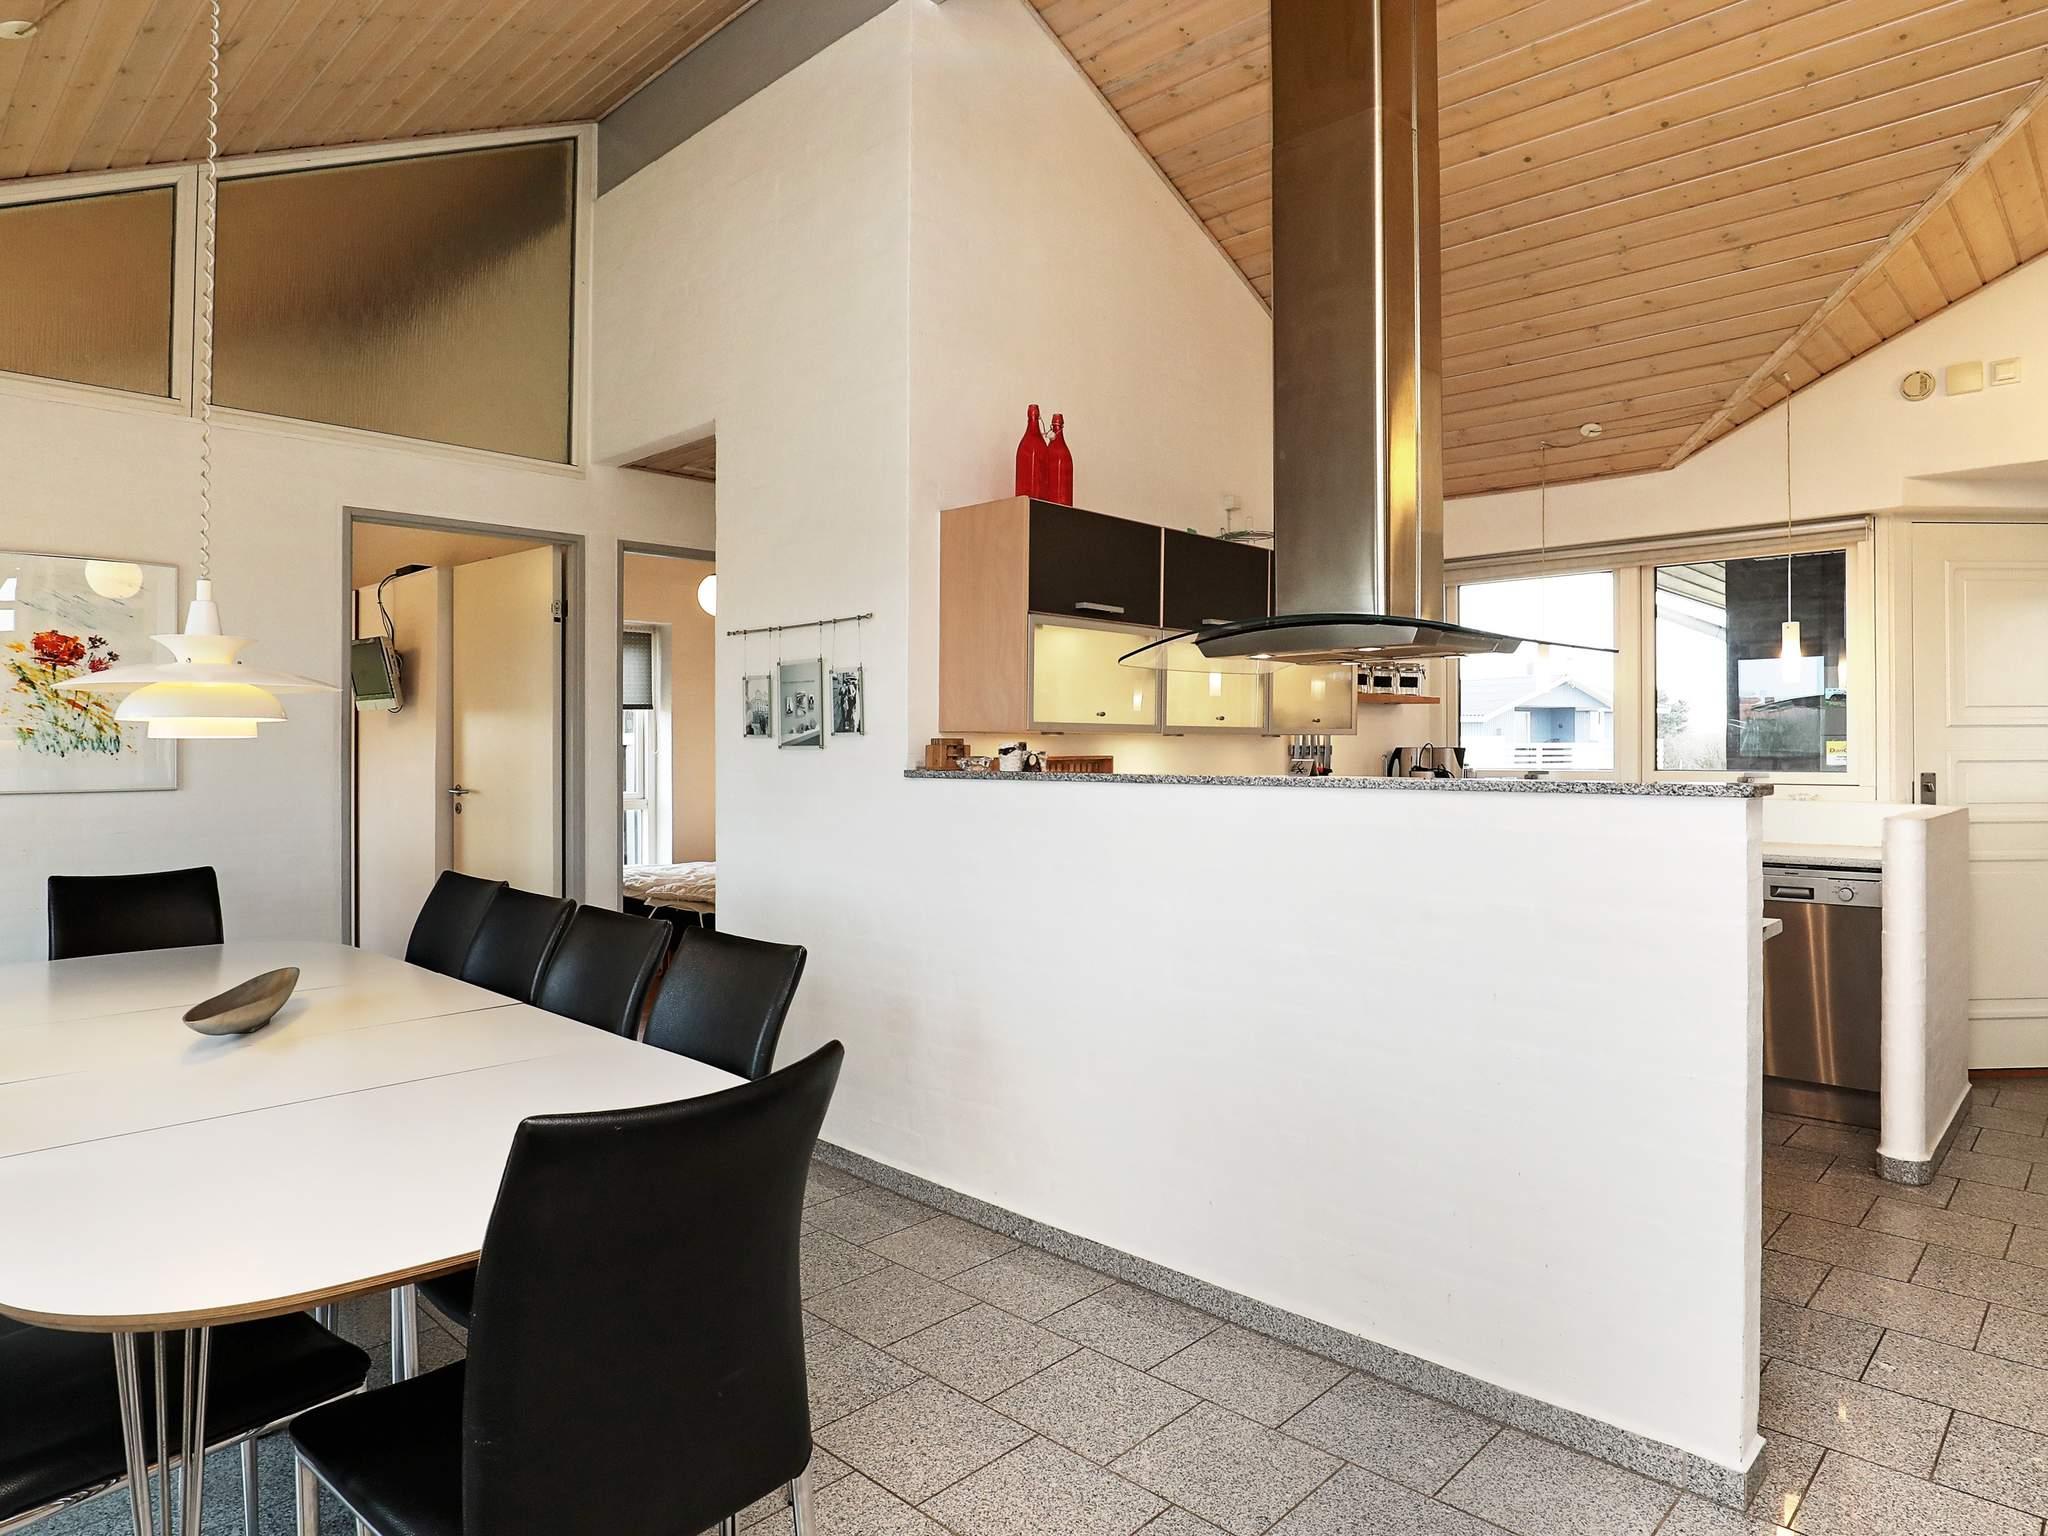 Ferienhaus Haurvig (125276), Hvide Sande, , Westjütland, Dänemark, Bild 5